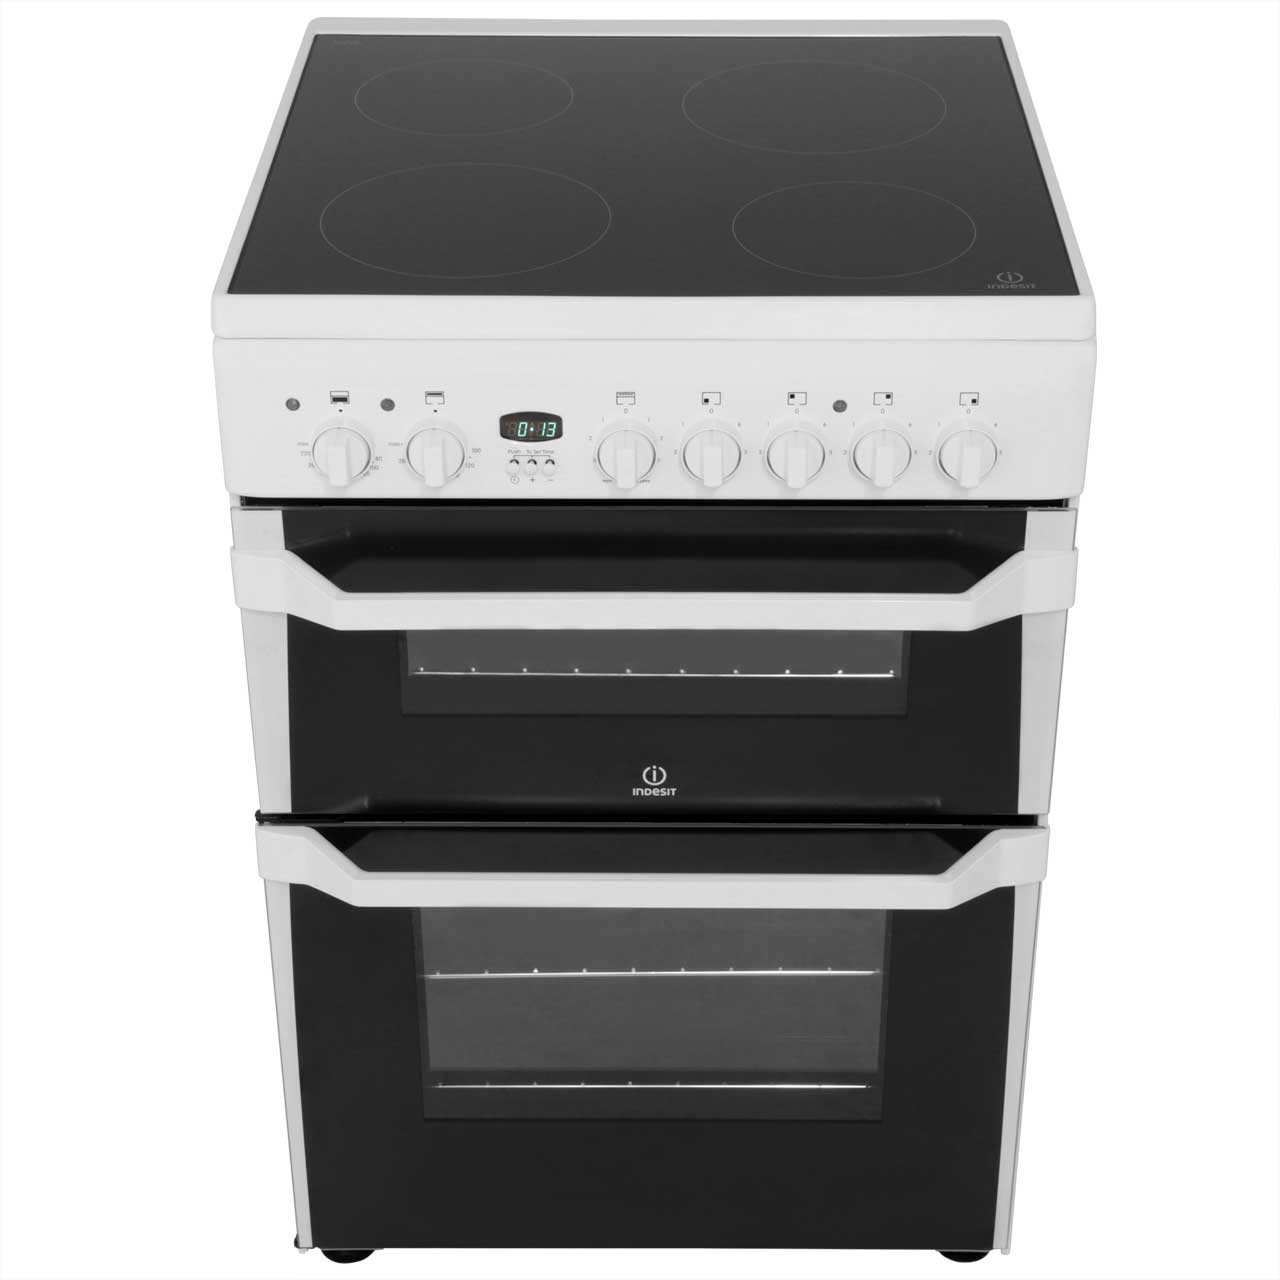 Boots Kitchen Appliances | Washing Machines, Fridges & More on